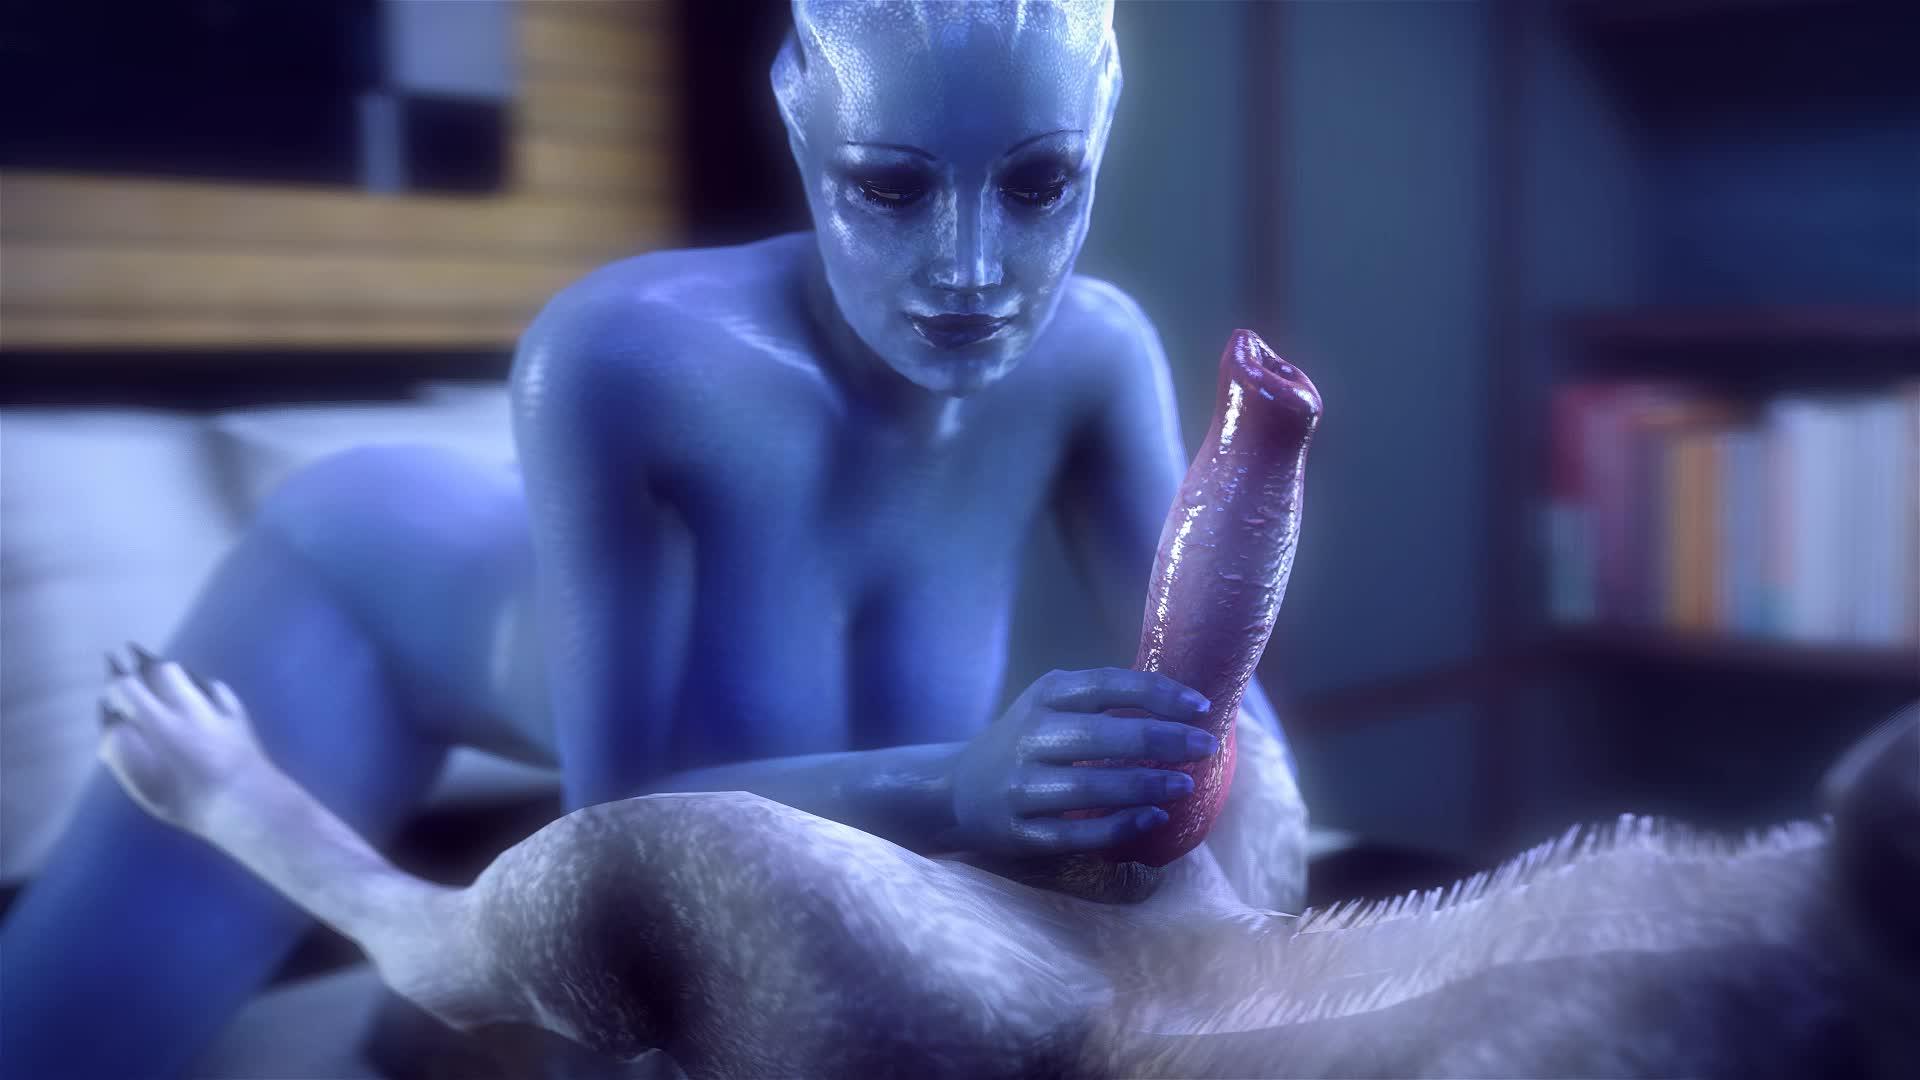 asari-fucks-boy-porn-prinky-chopra-nudu-teans